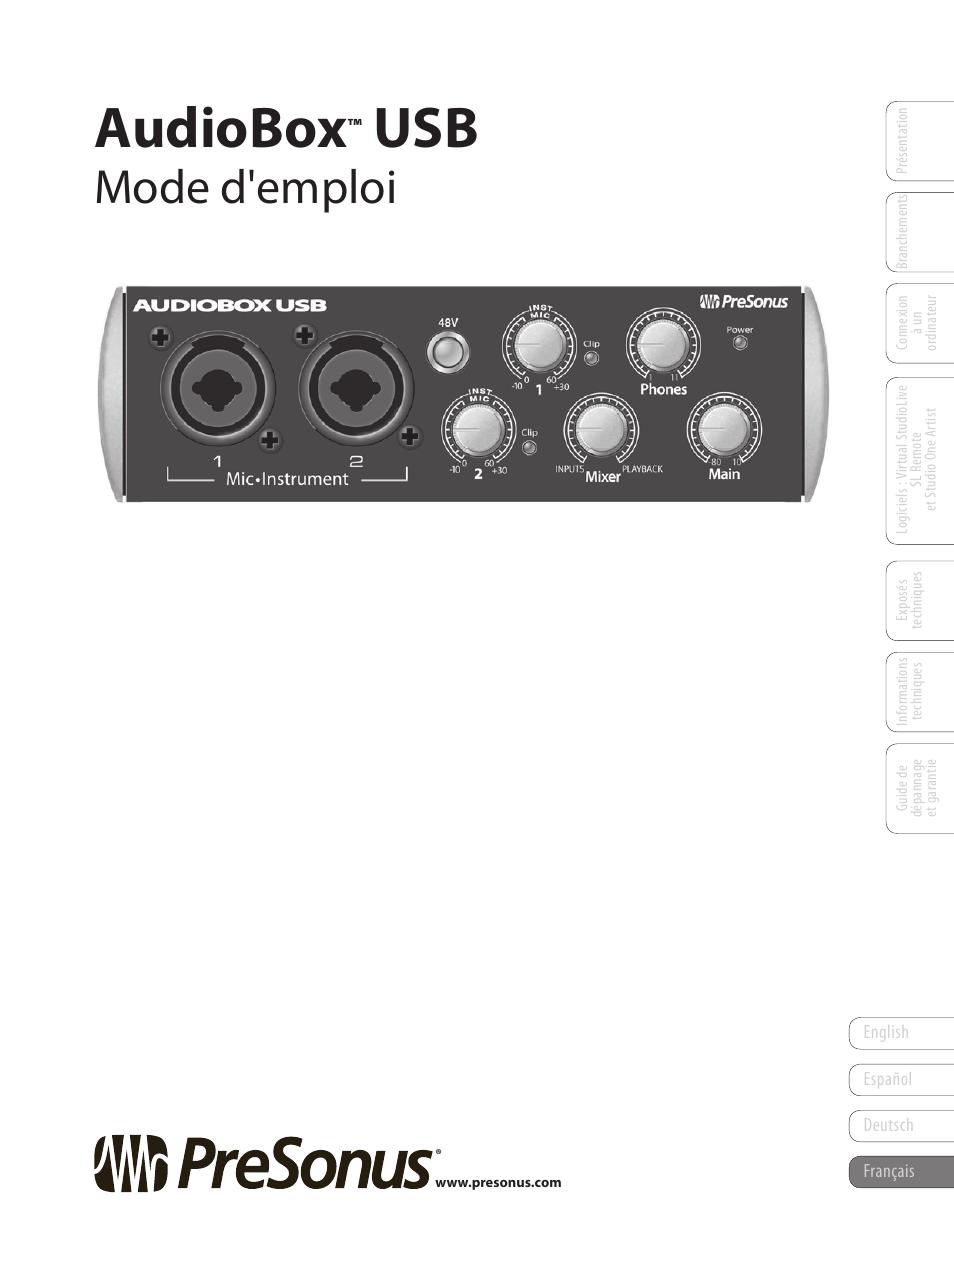 presonus audiobox usb manuel d 39 utilisation pages 64. Black Bedroom Furniture Sets. Home Design Ideas